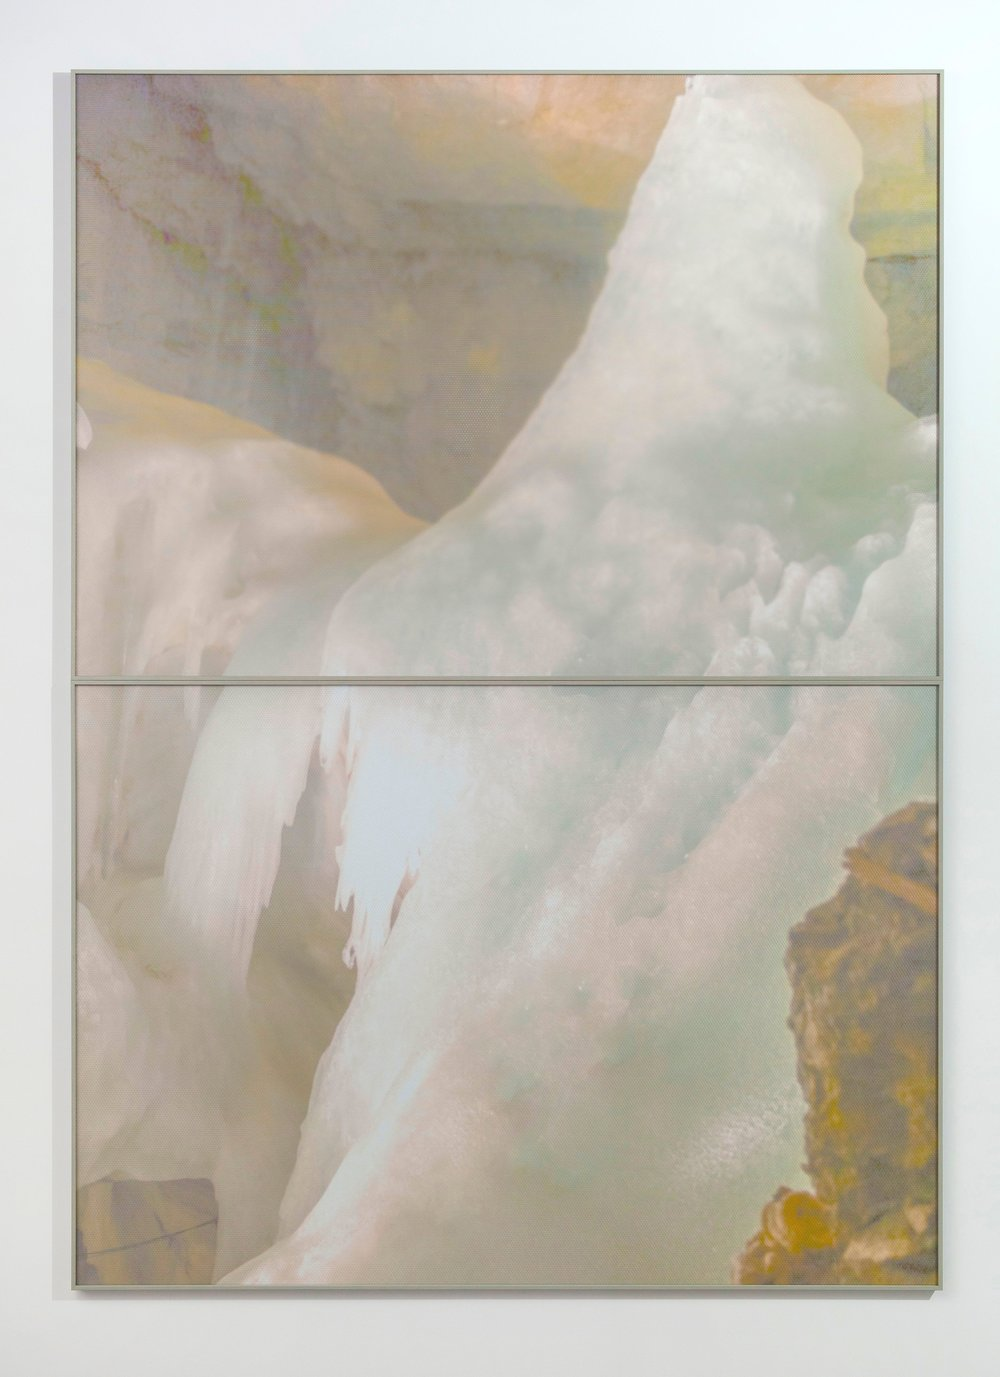 Atlas Obscura (The Dictaean Cave) / Part V (Diptych),  2019 Wax pastels, UV-print on aluminium beneath marbled Plexiglas 240 x 170 cm (95 x 67 in)